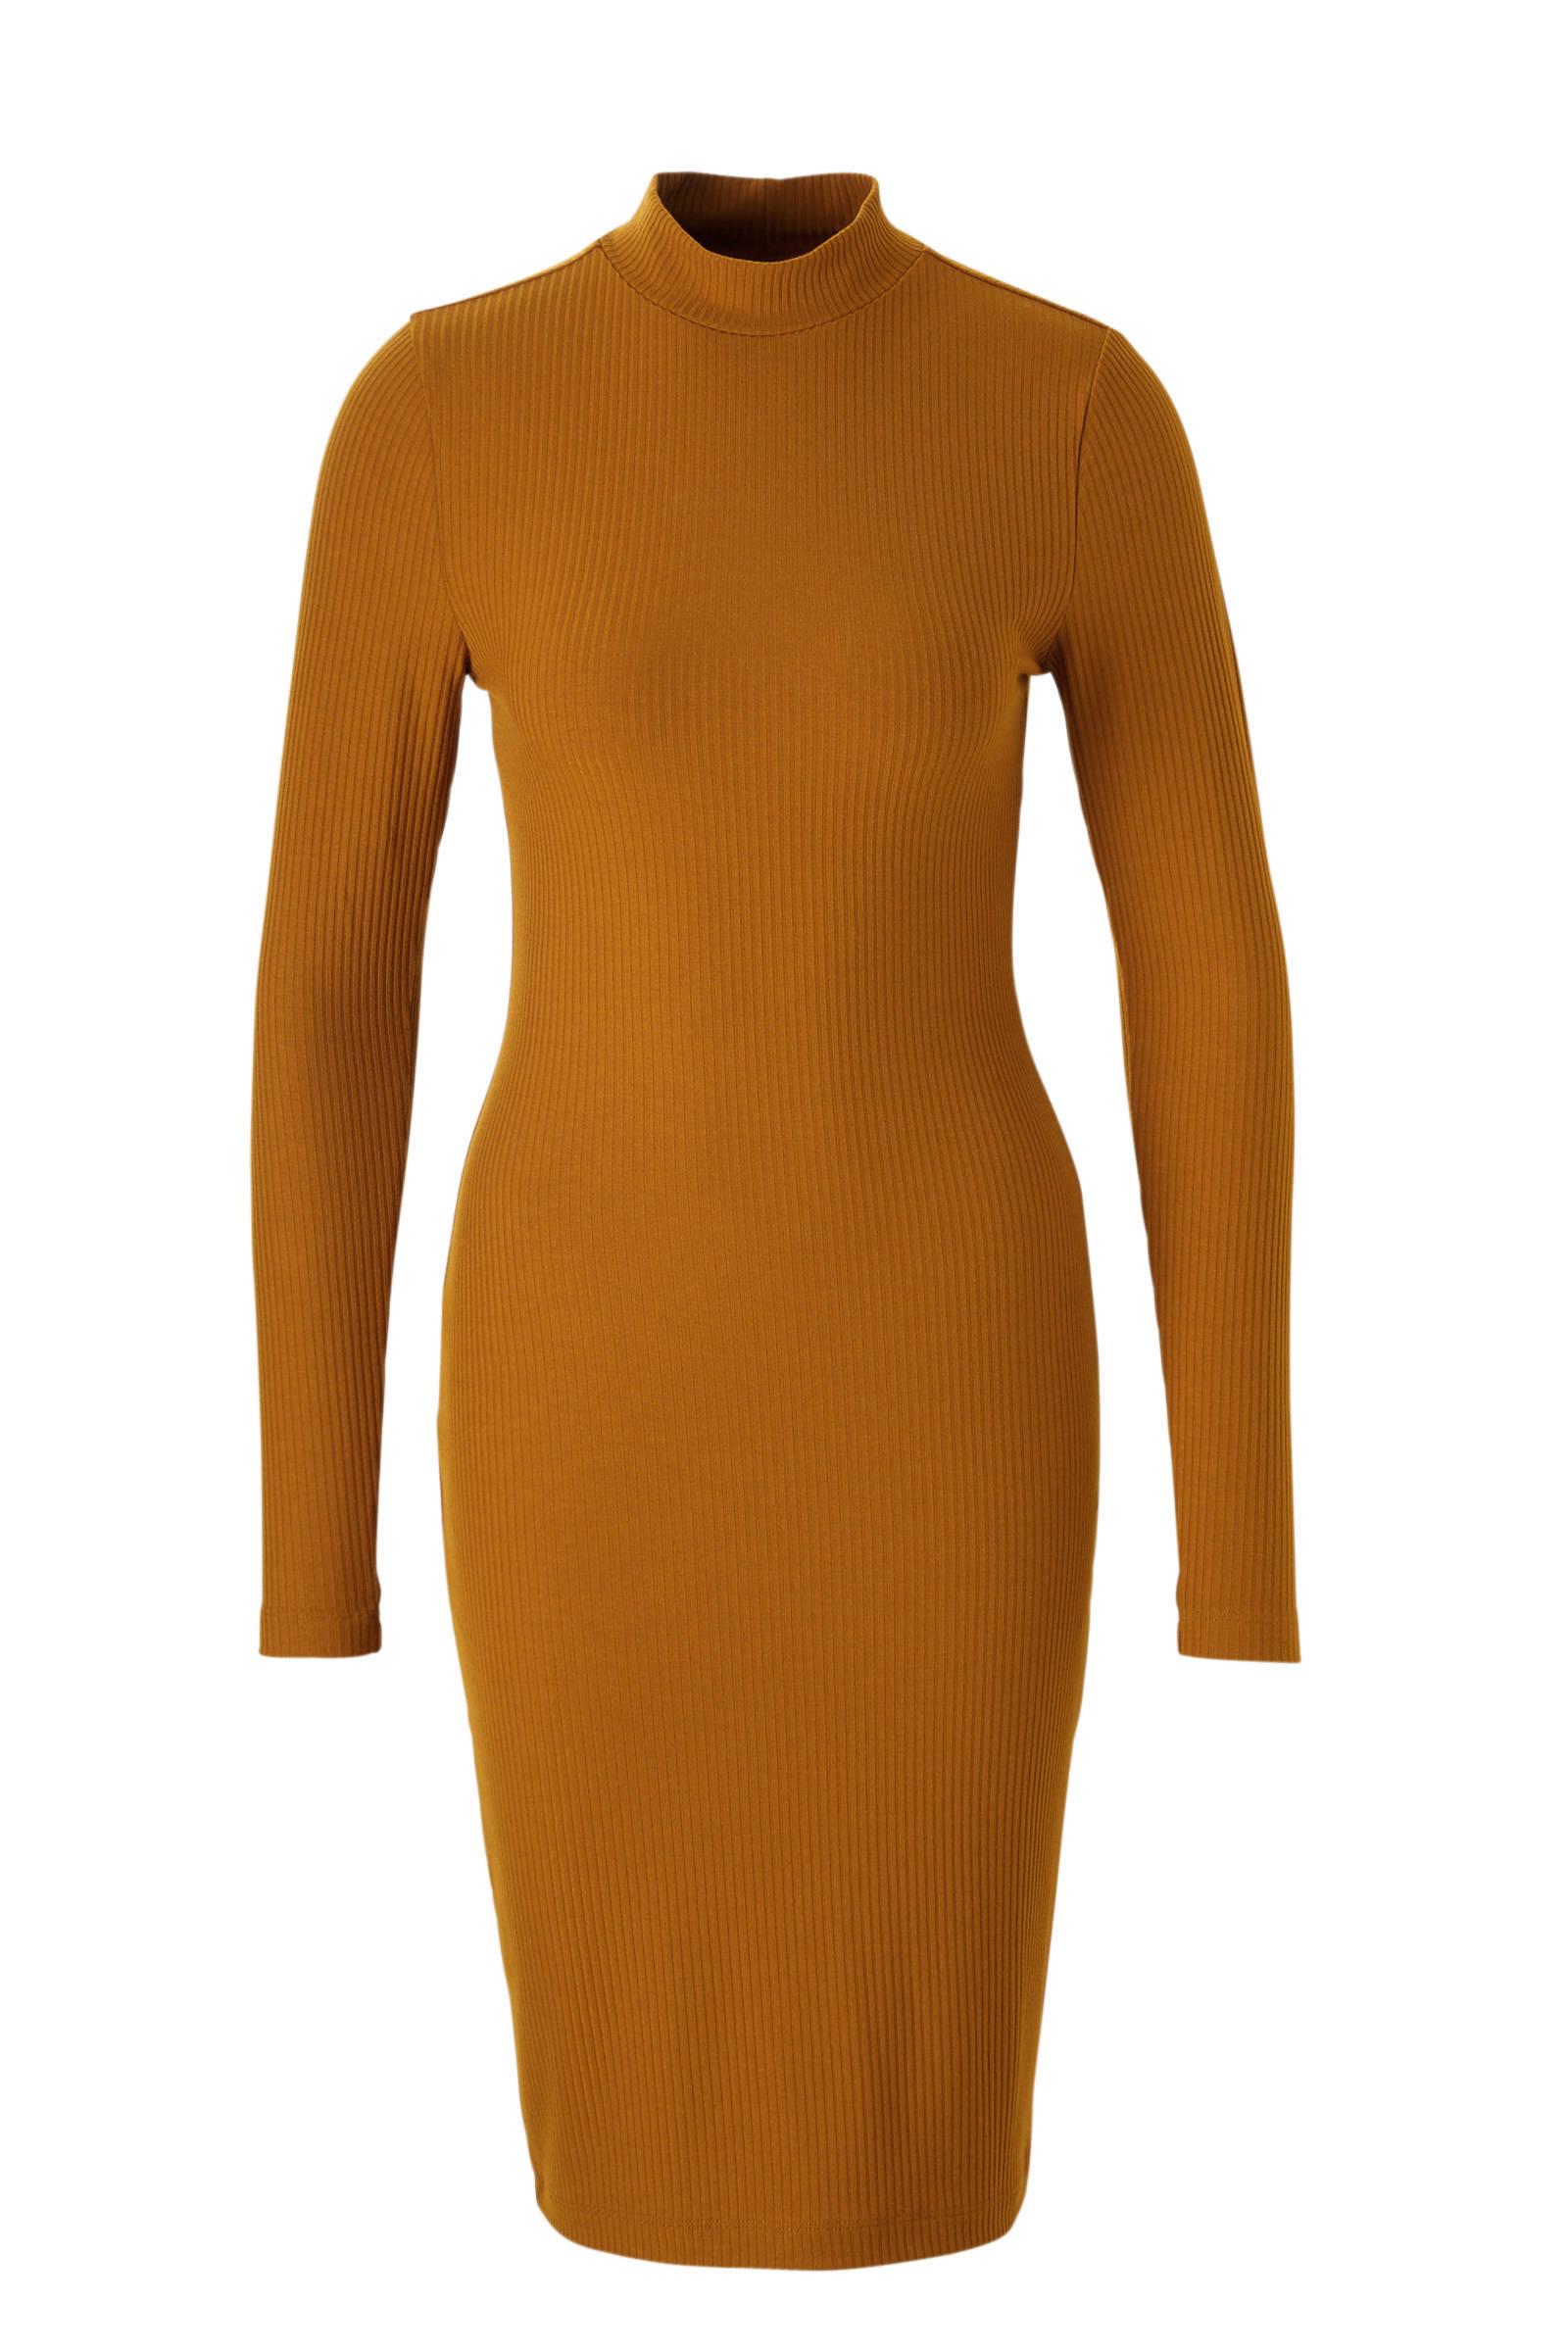 gebreide jurk okergeel